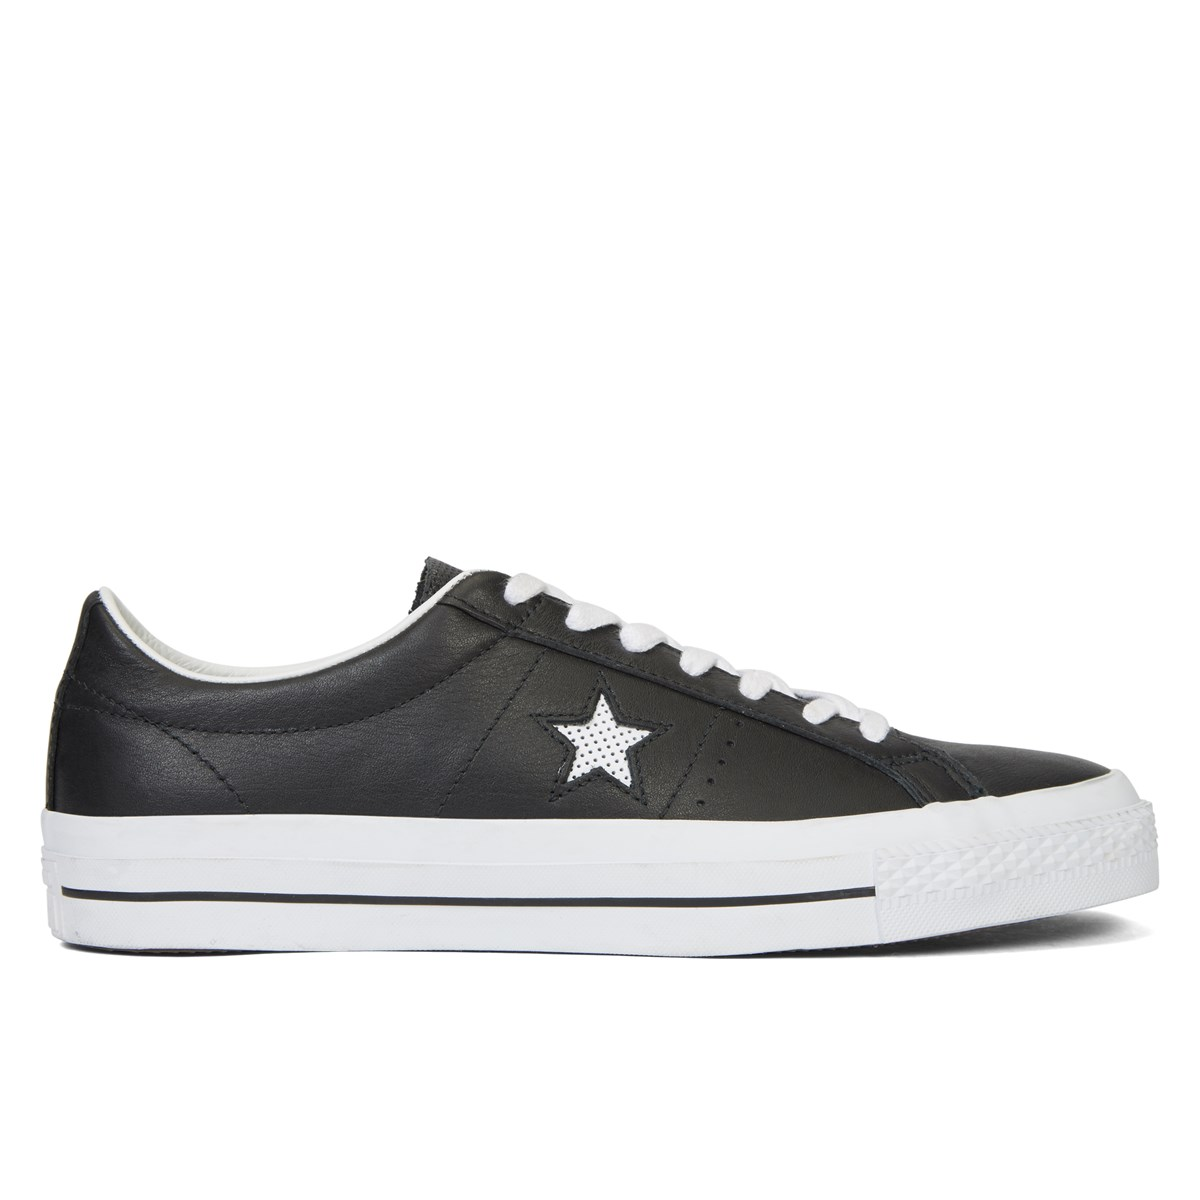 Men's One Star OX Leather Black & White Sneaker